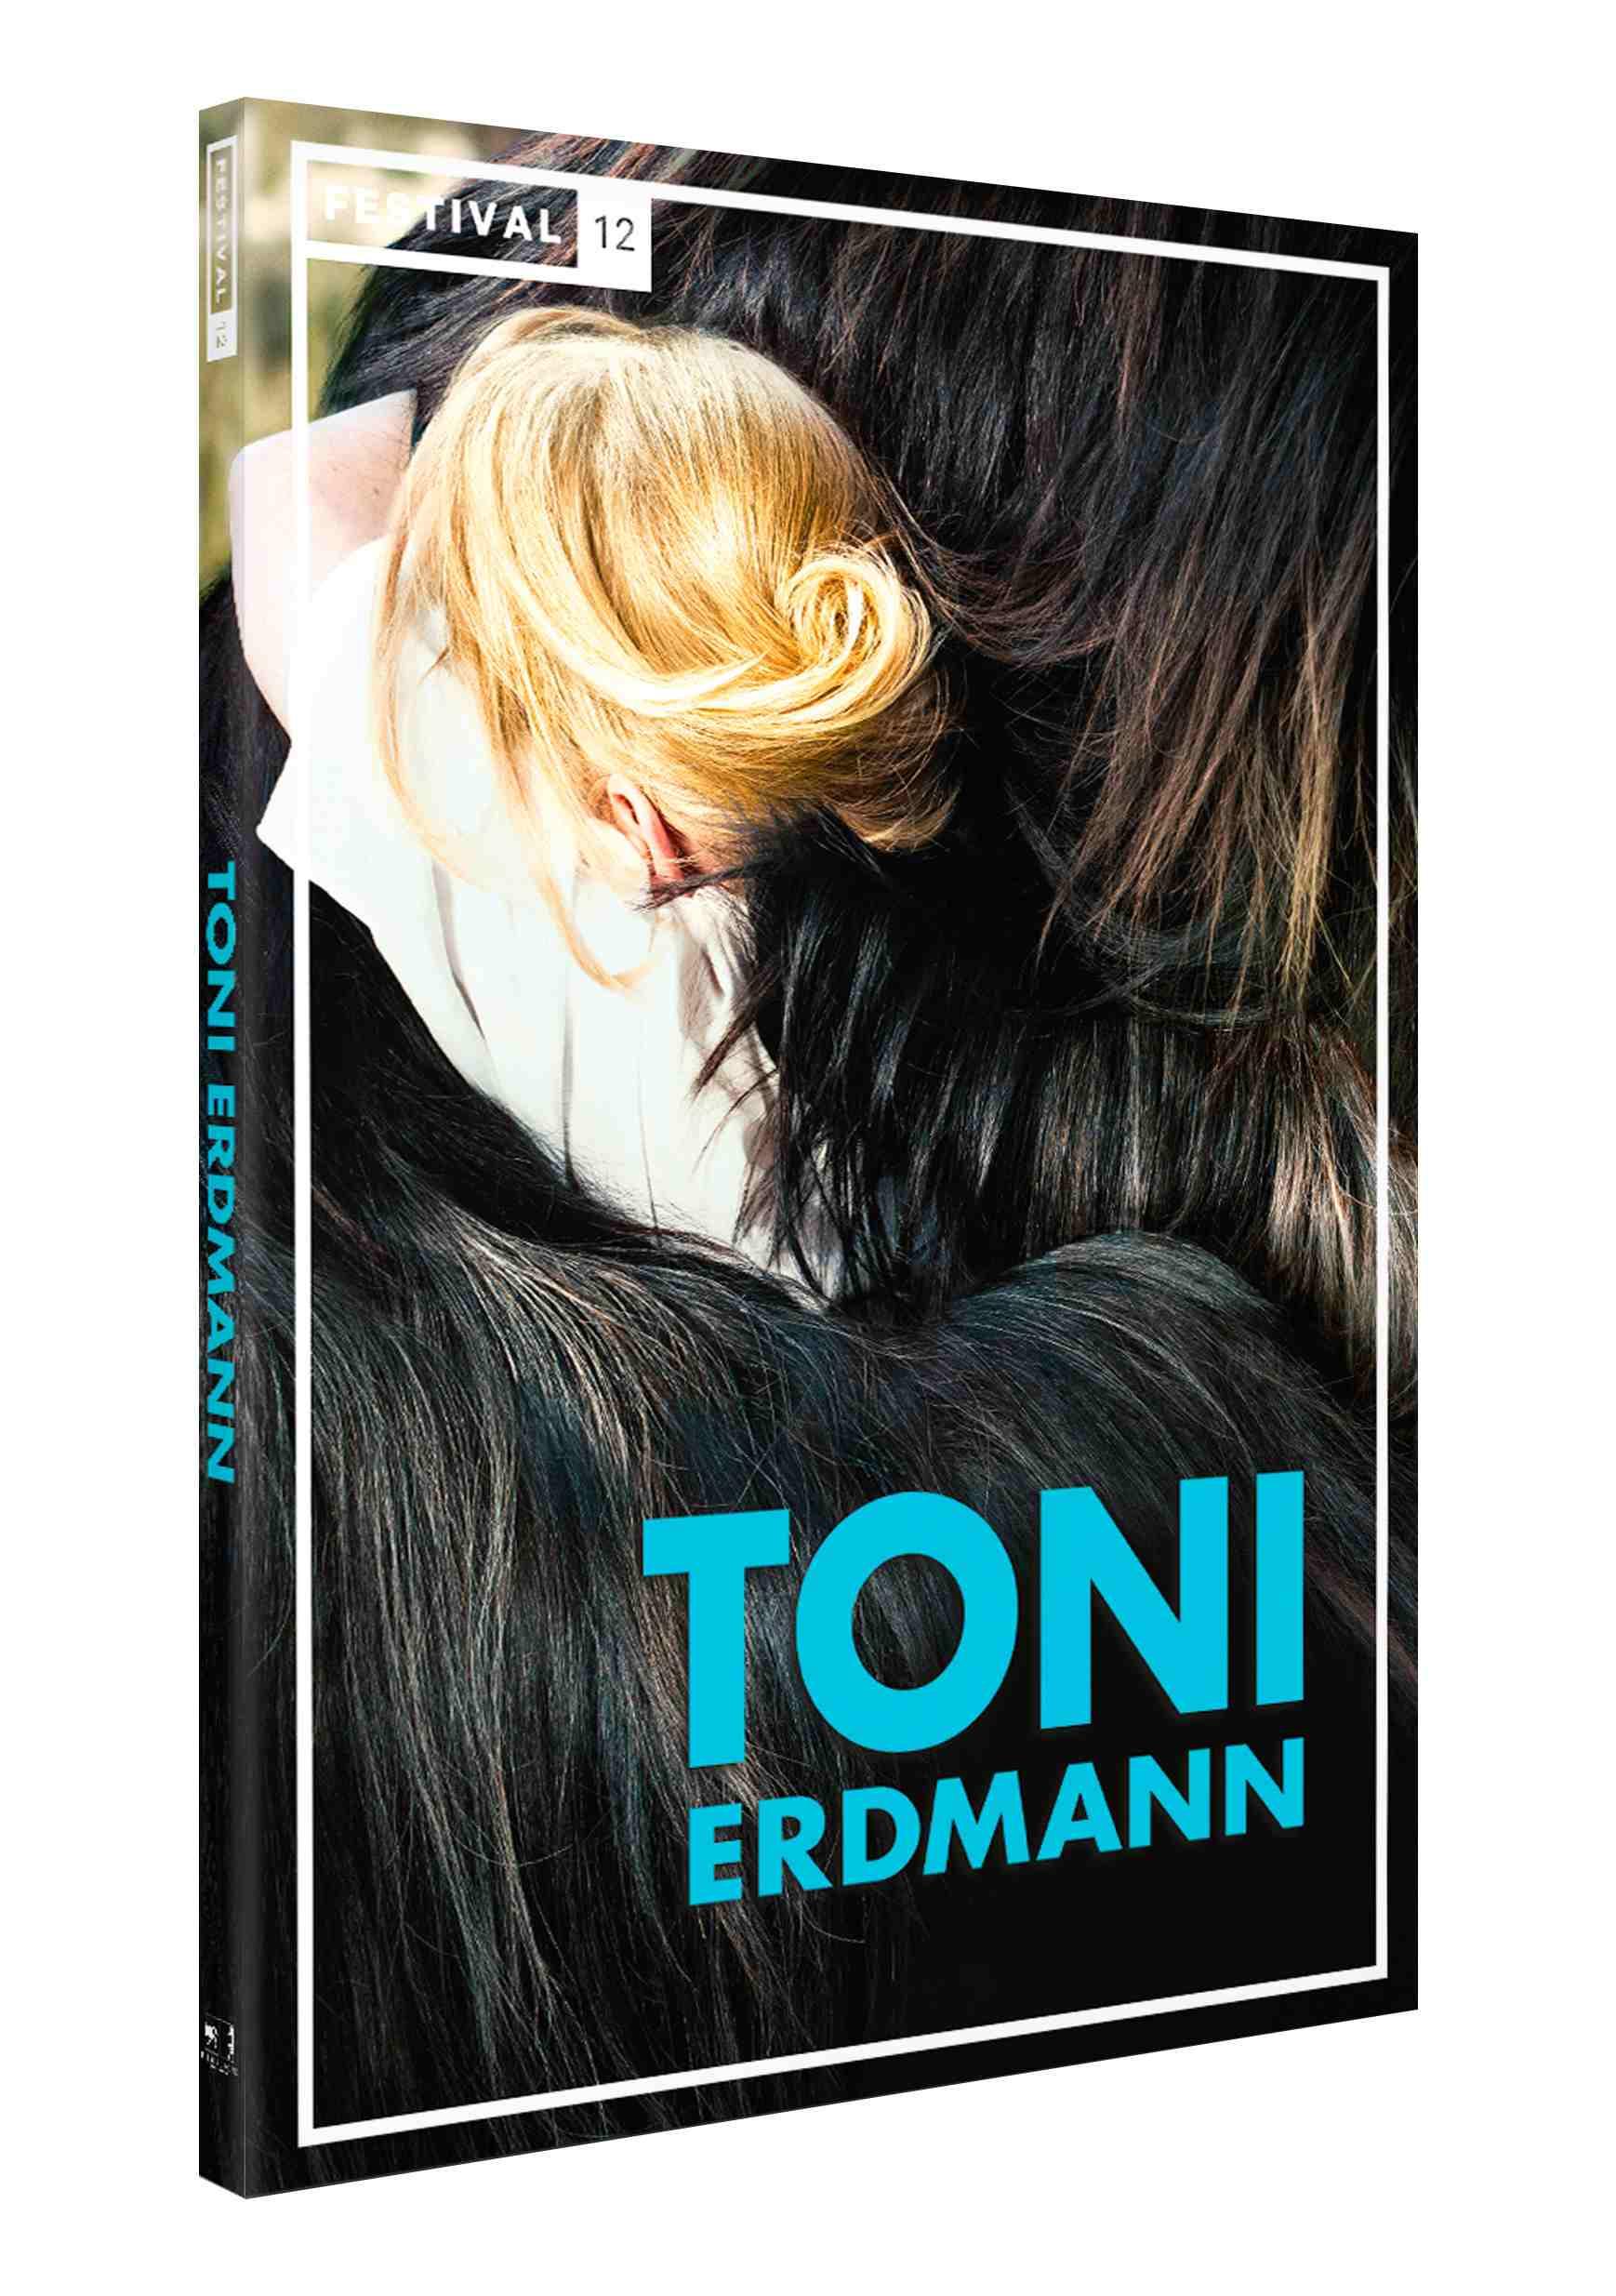 Toni Erdmann film_Image slider_festival de cannes_Bay